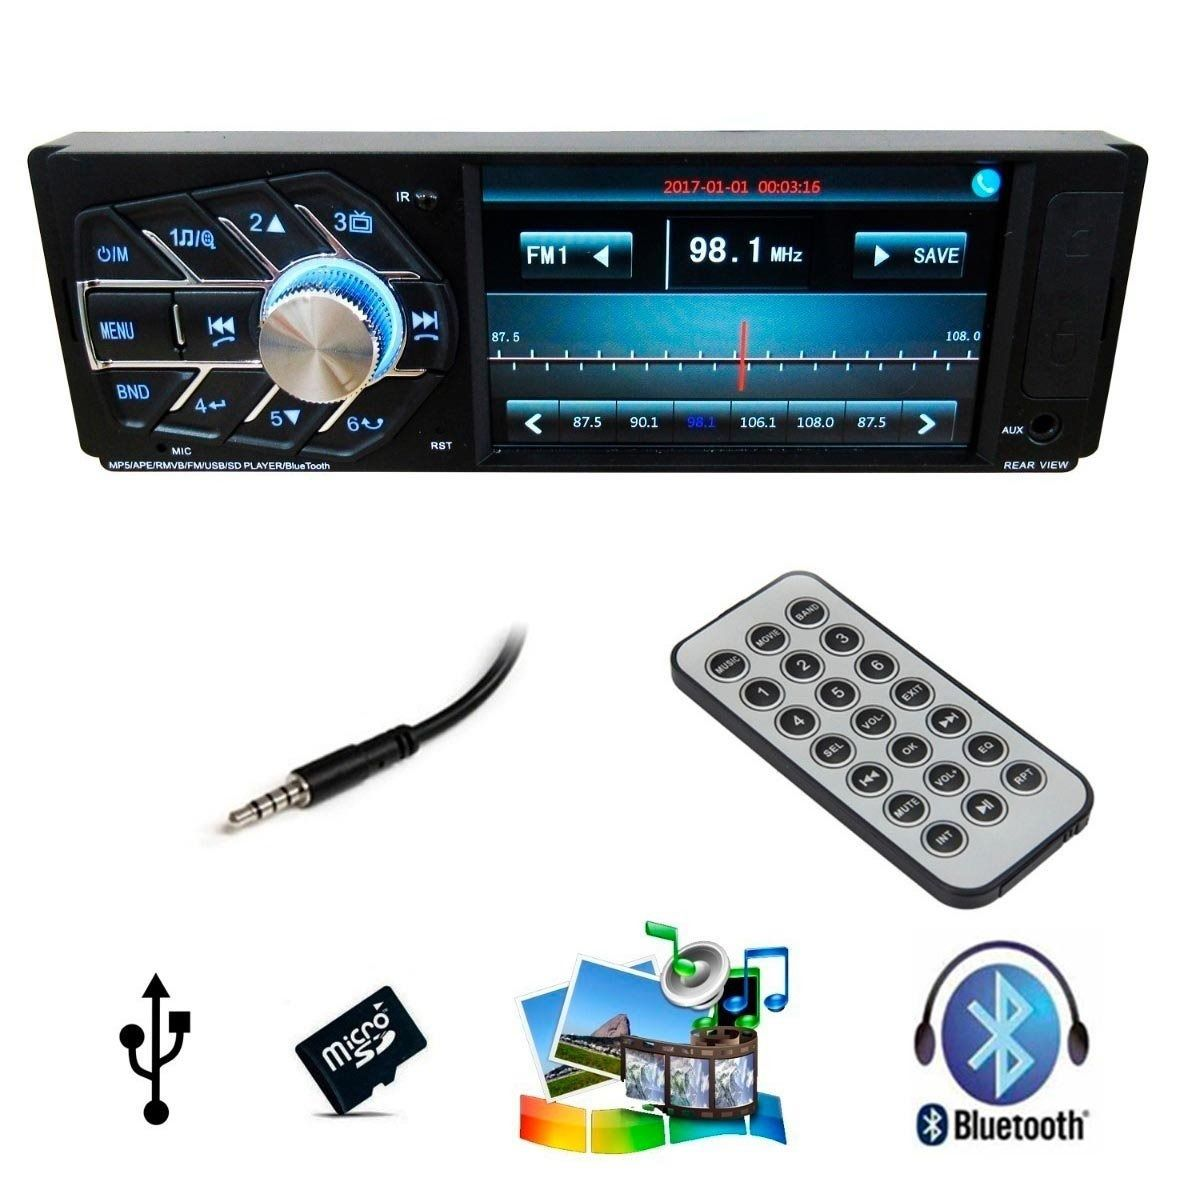 Radio Bluetooth Automotivo Mp5 Tela Lcd Fm Usb Carro Cartao (4124)